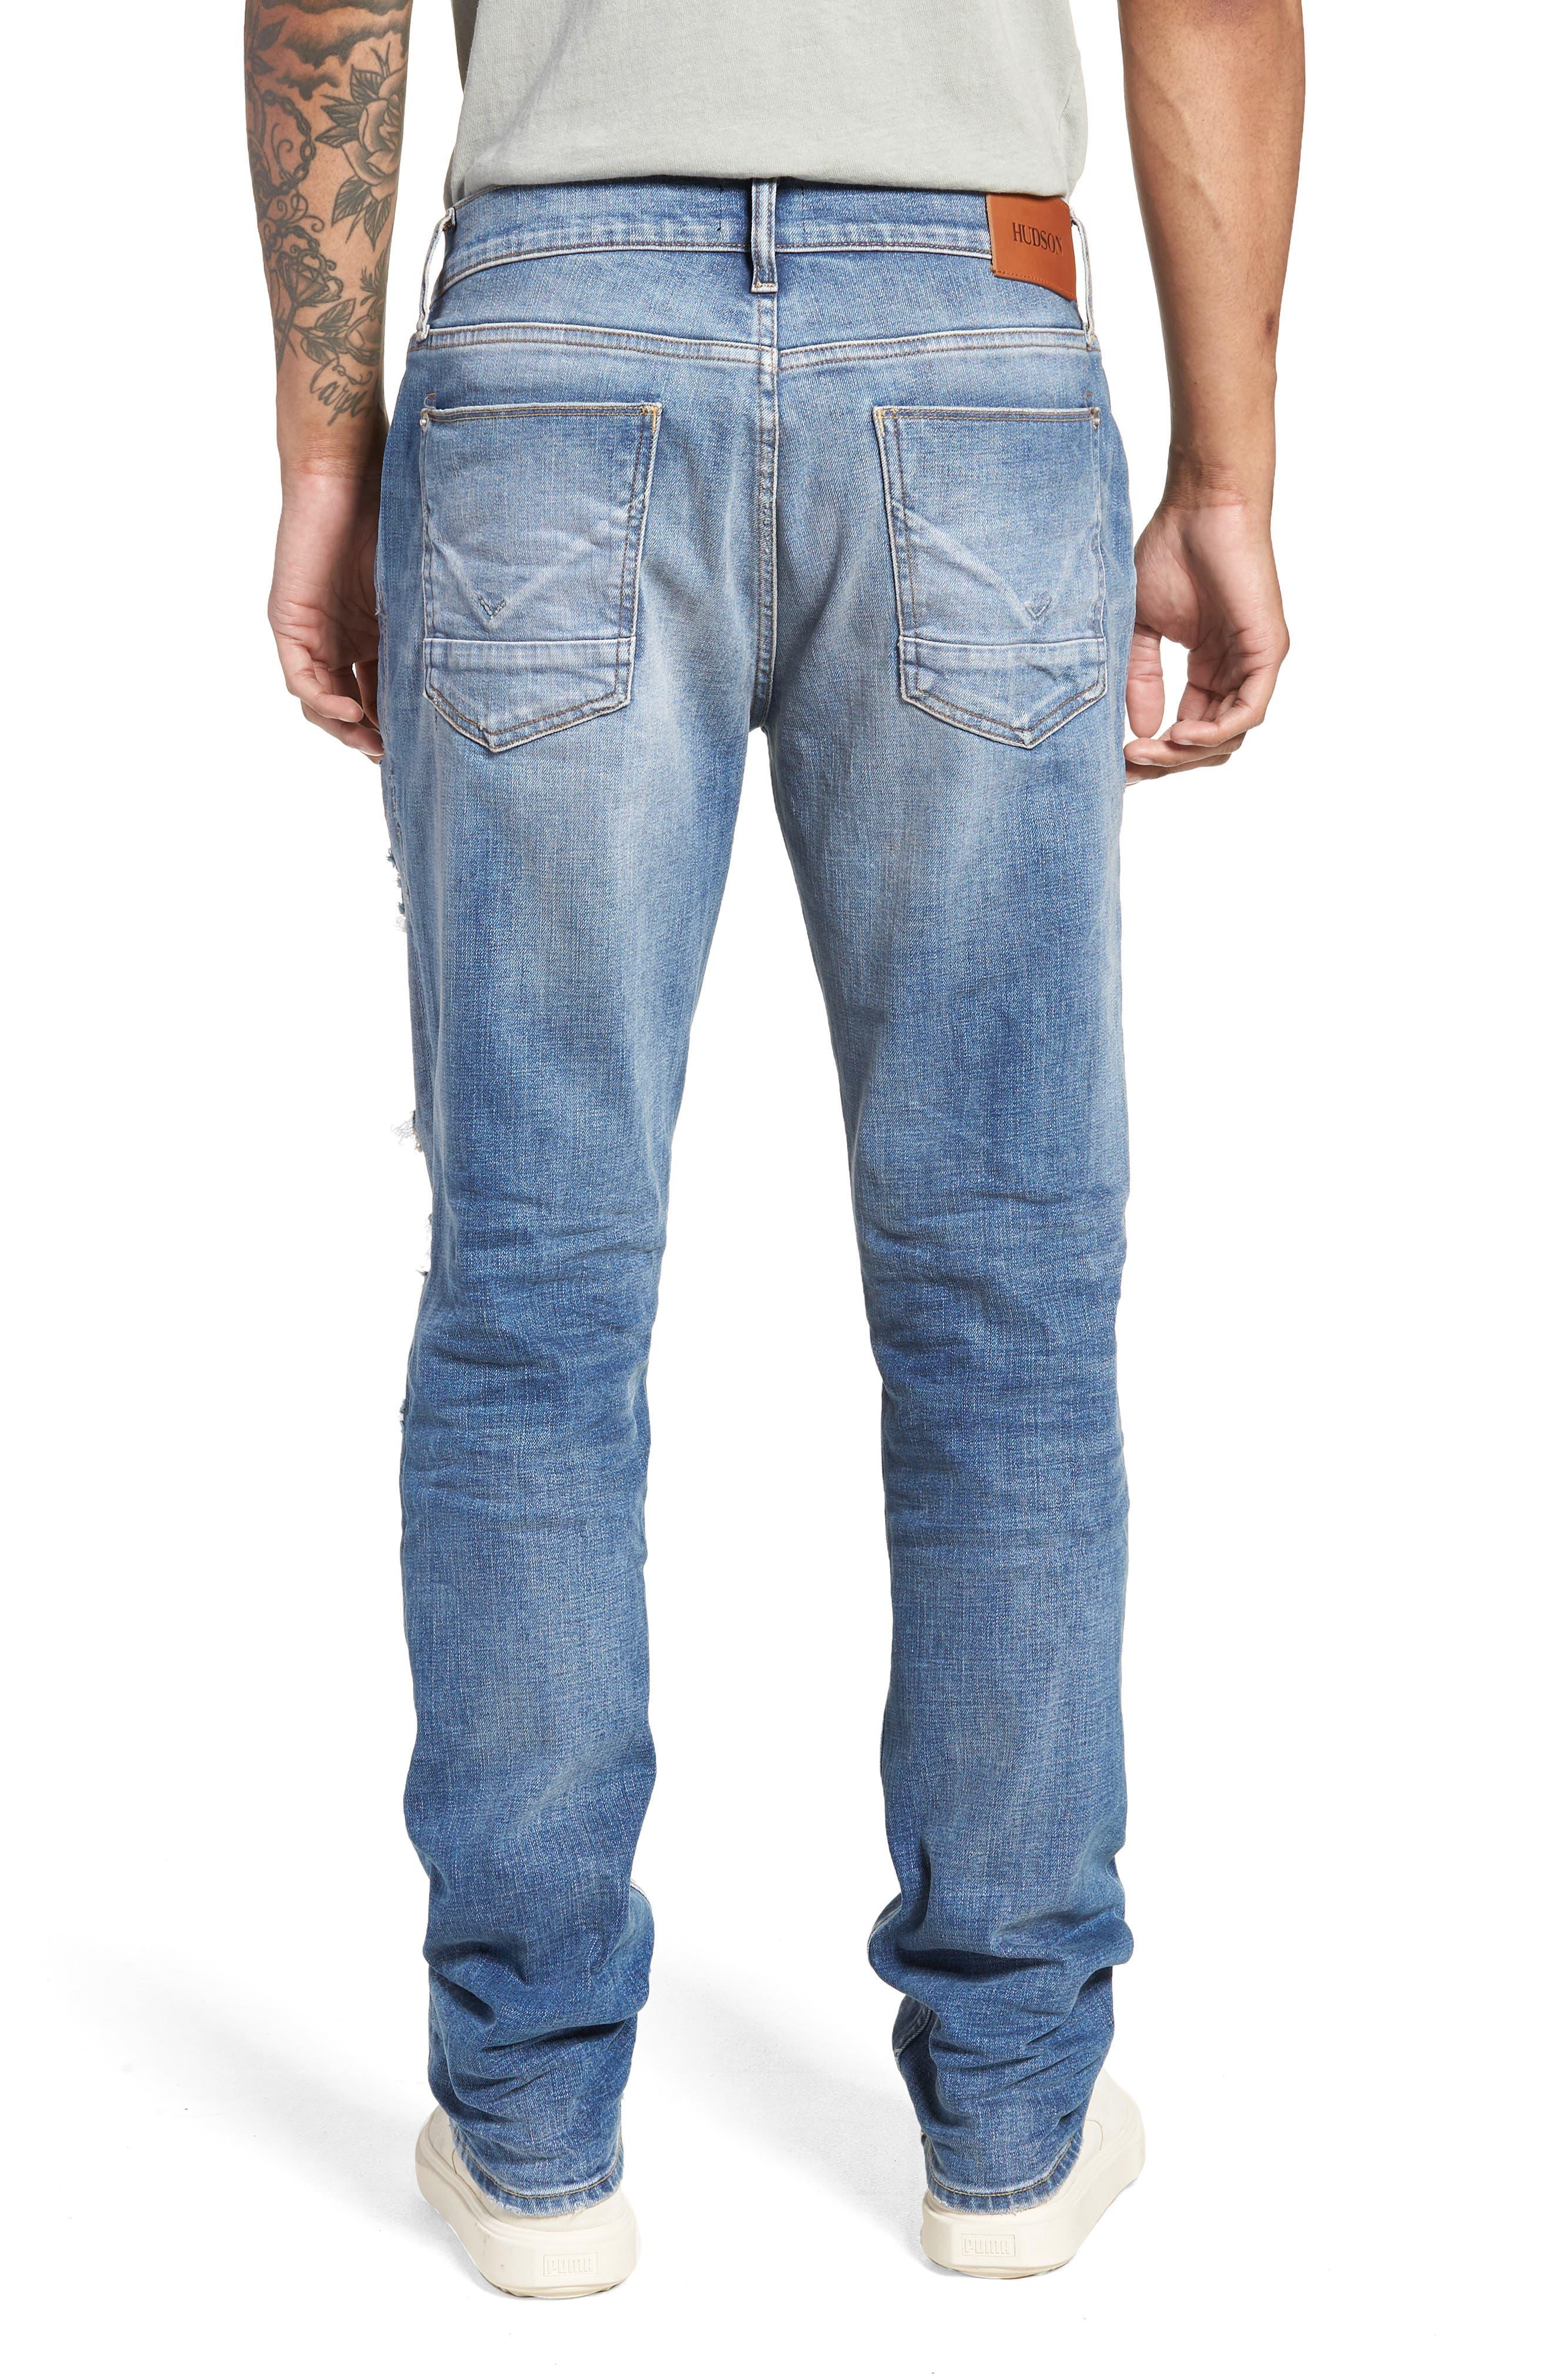 Blake Slim Fit Jeans,                             Alternate thumbnail 2, color,                             421